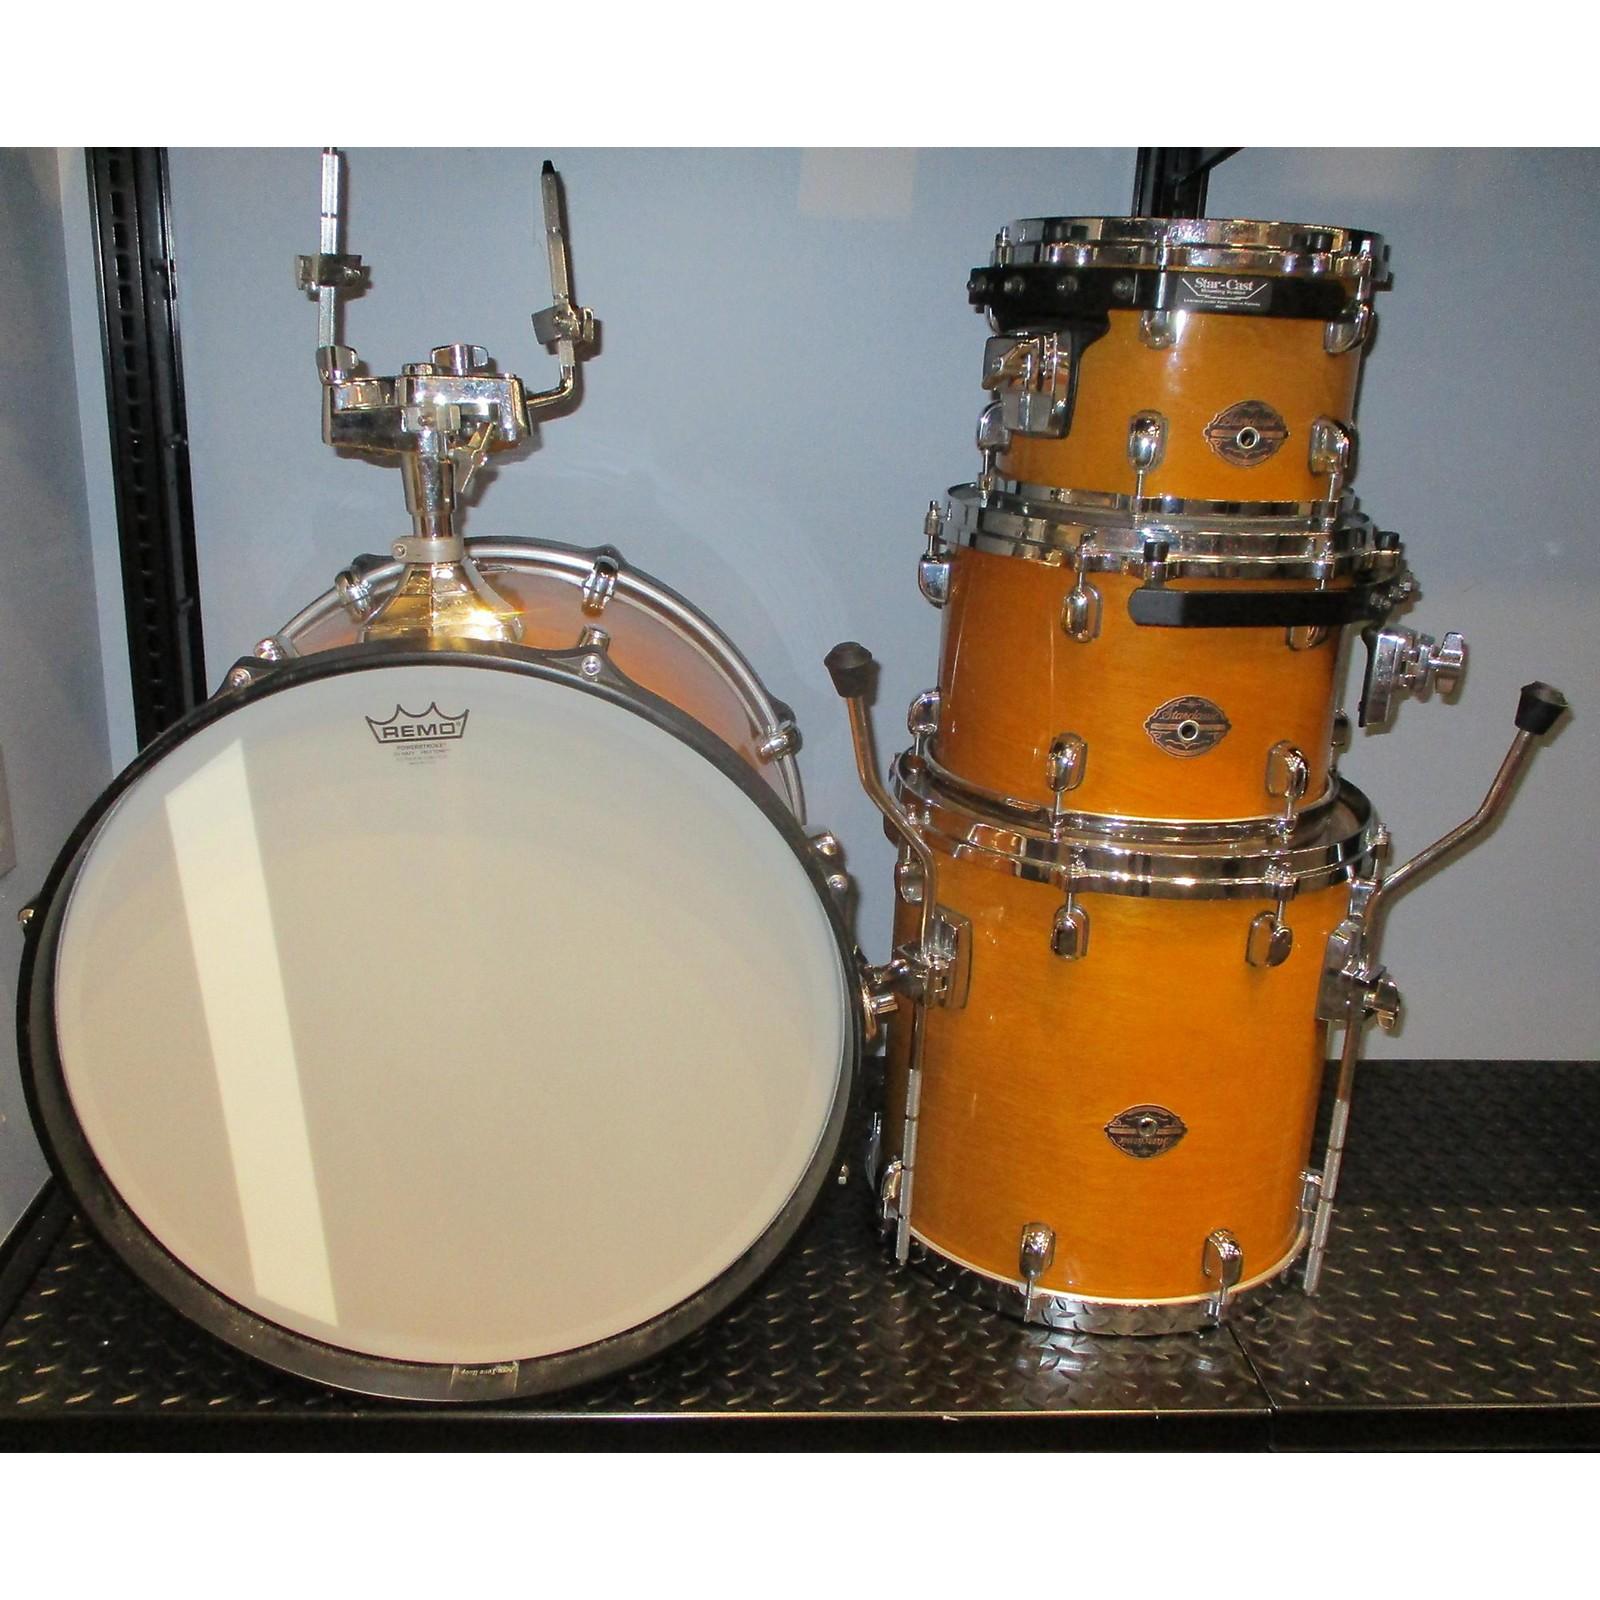 TAMA 1997 Starclassic Drum Kit